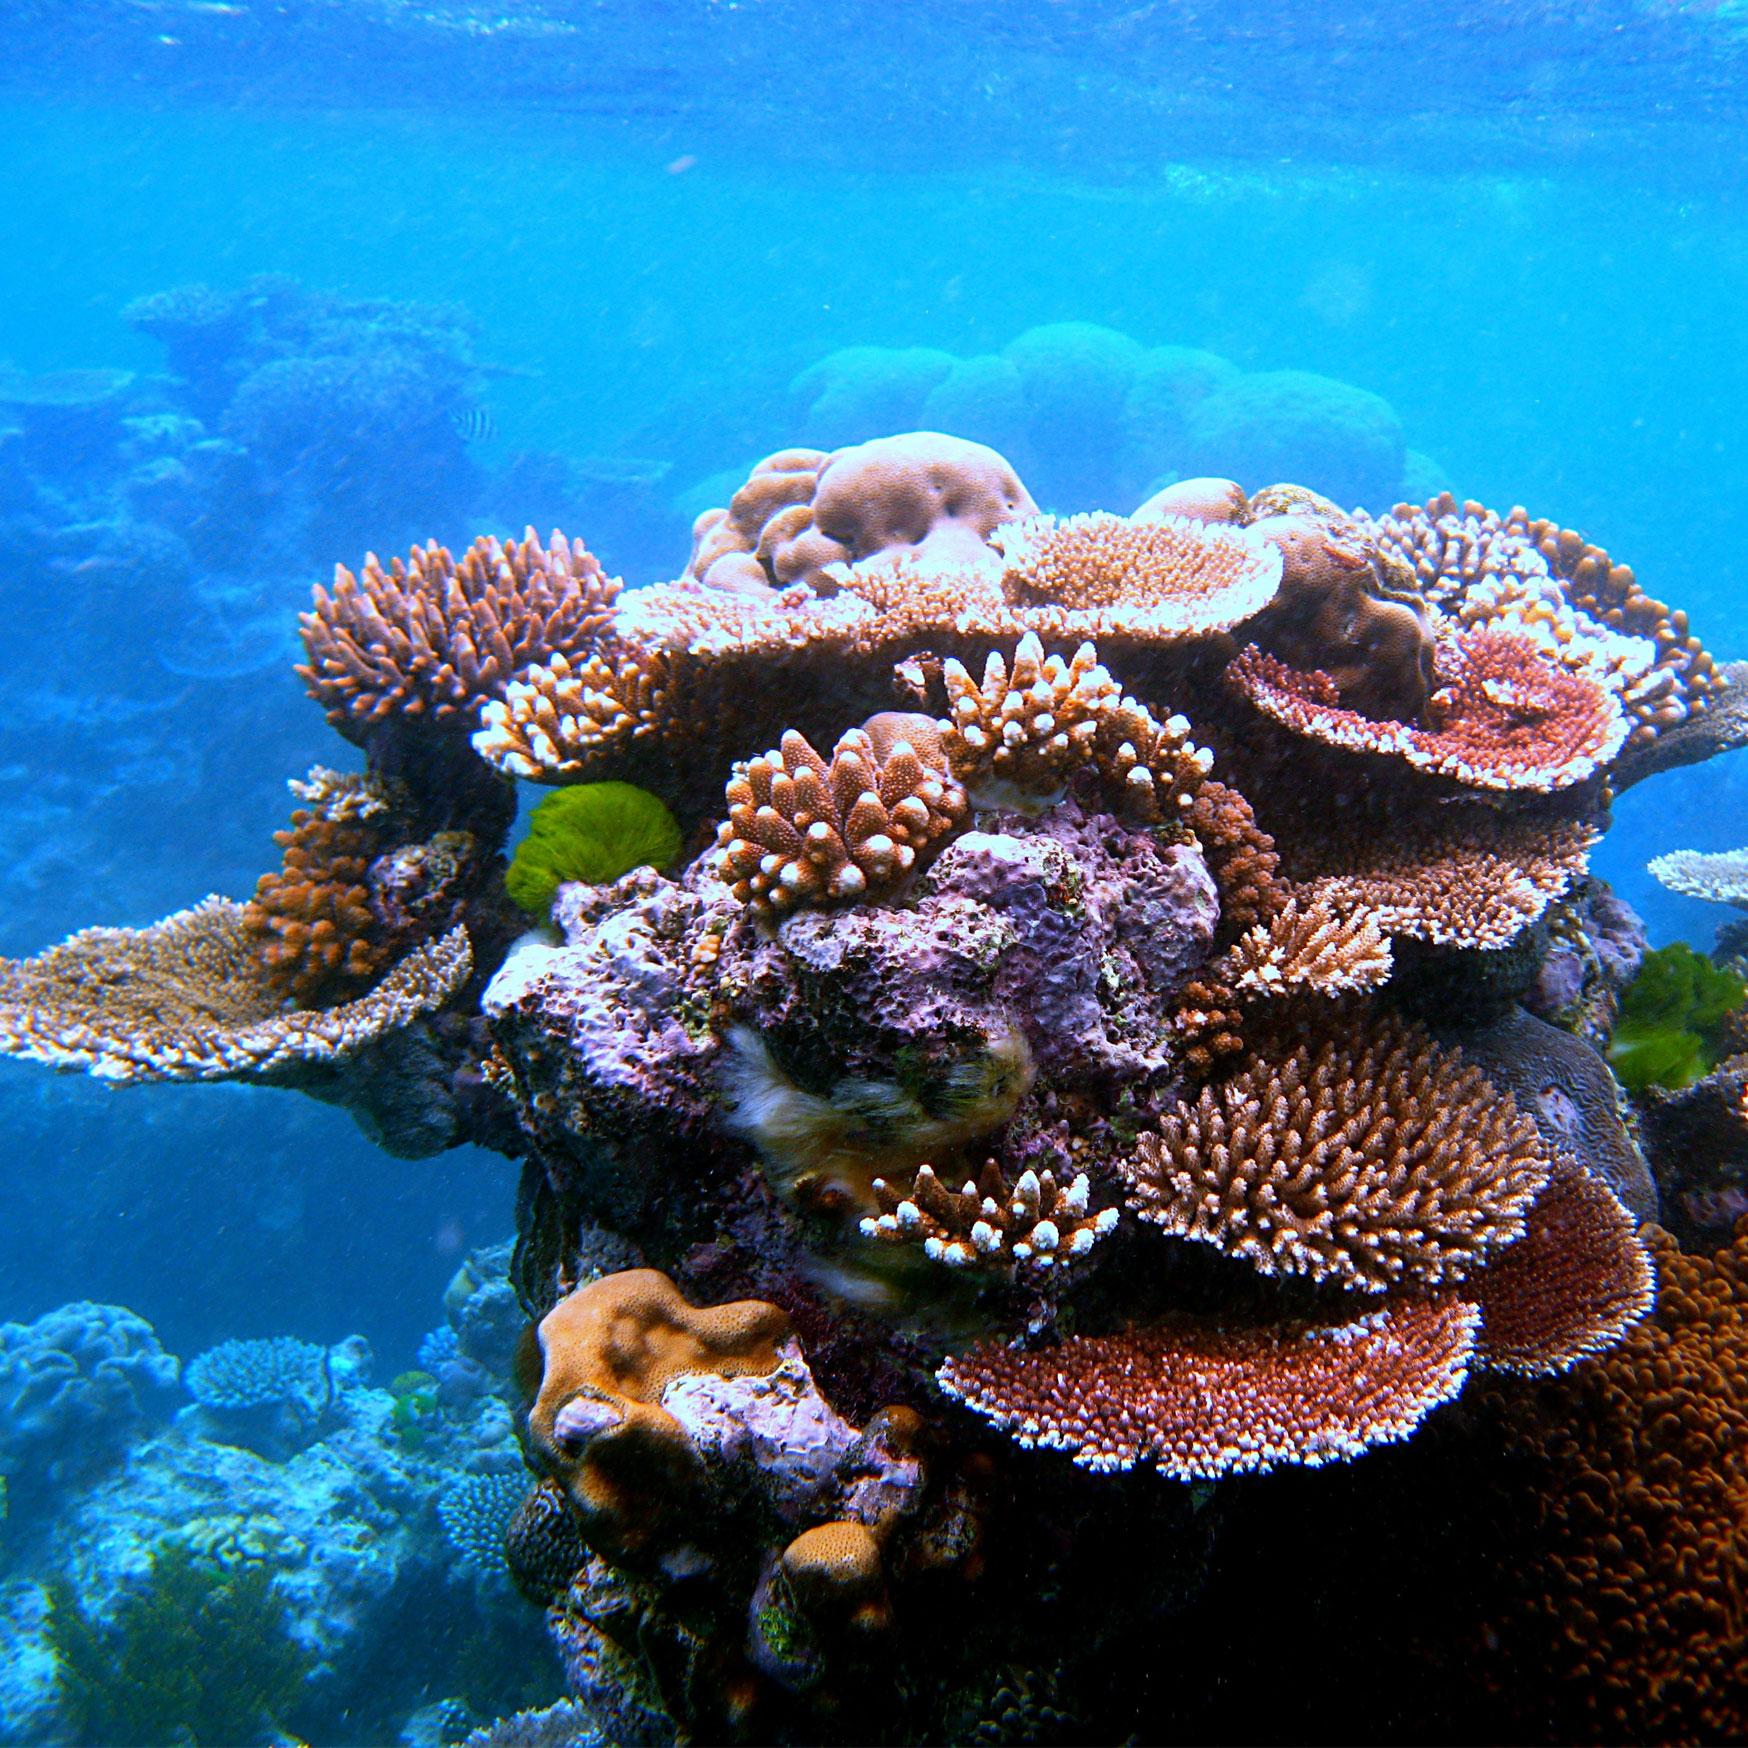 Coral Gardening, Coral farming